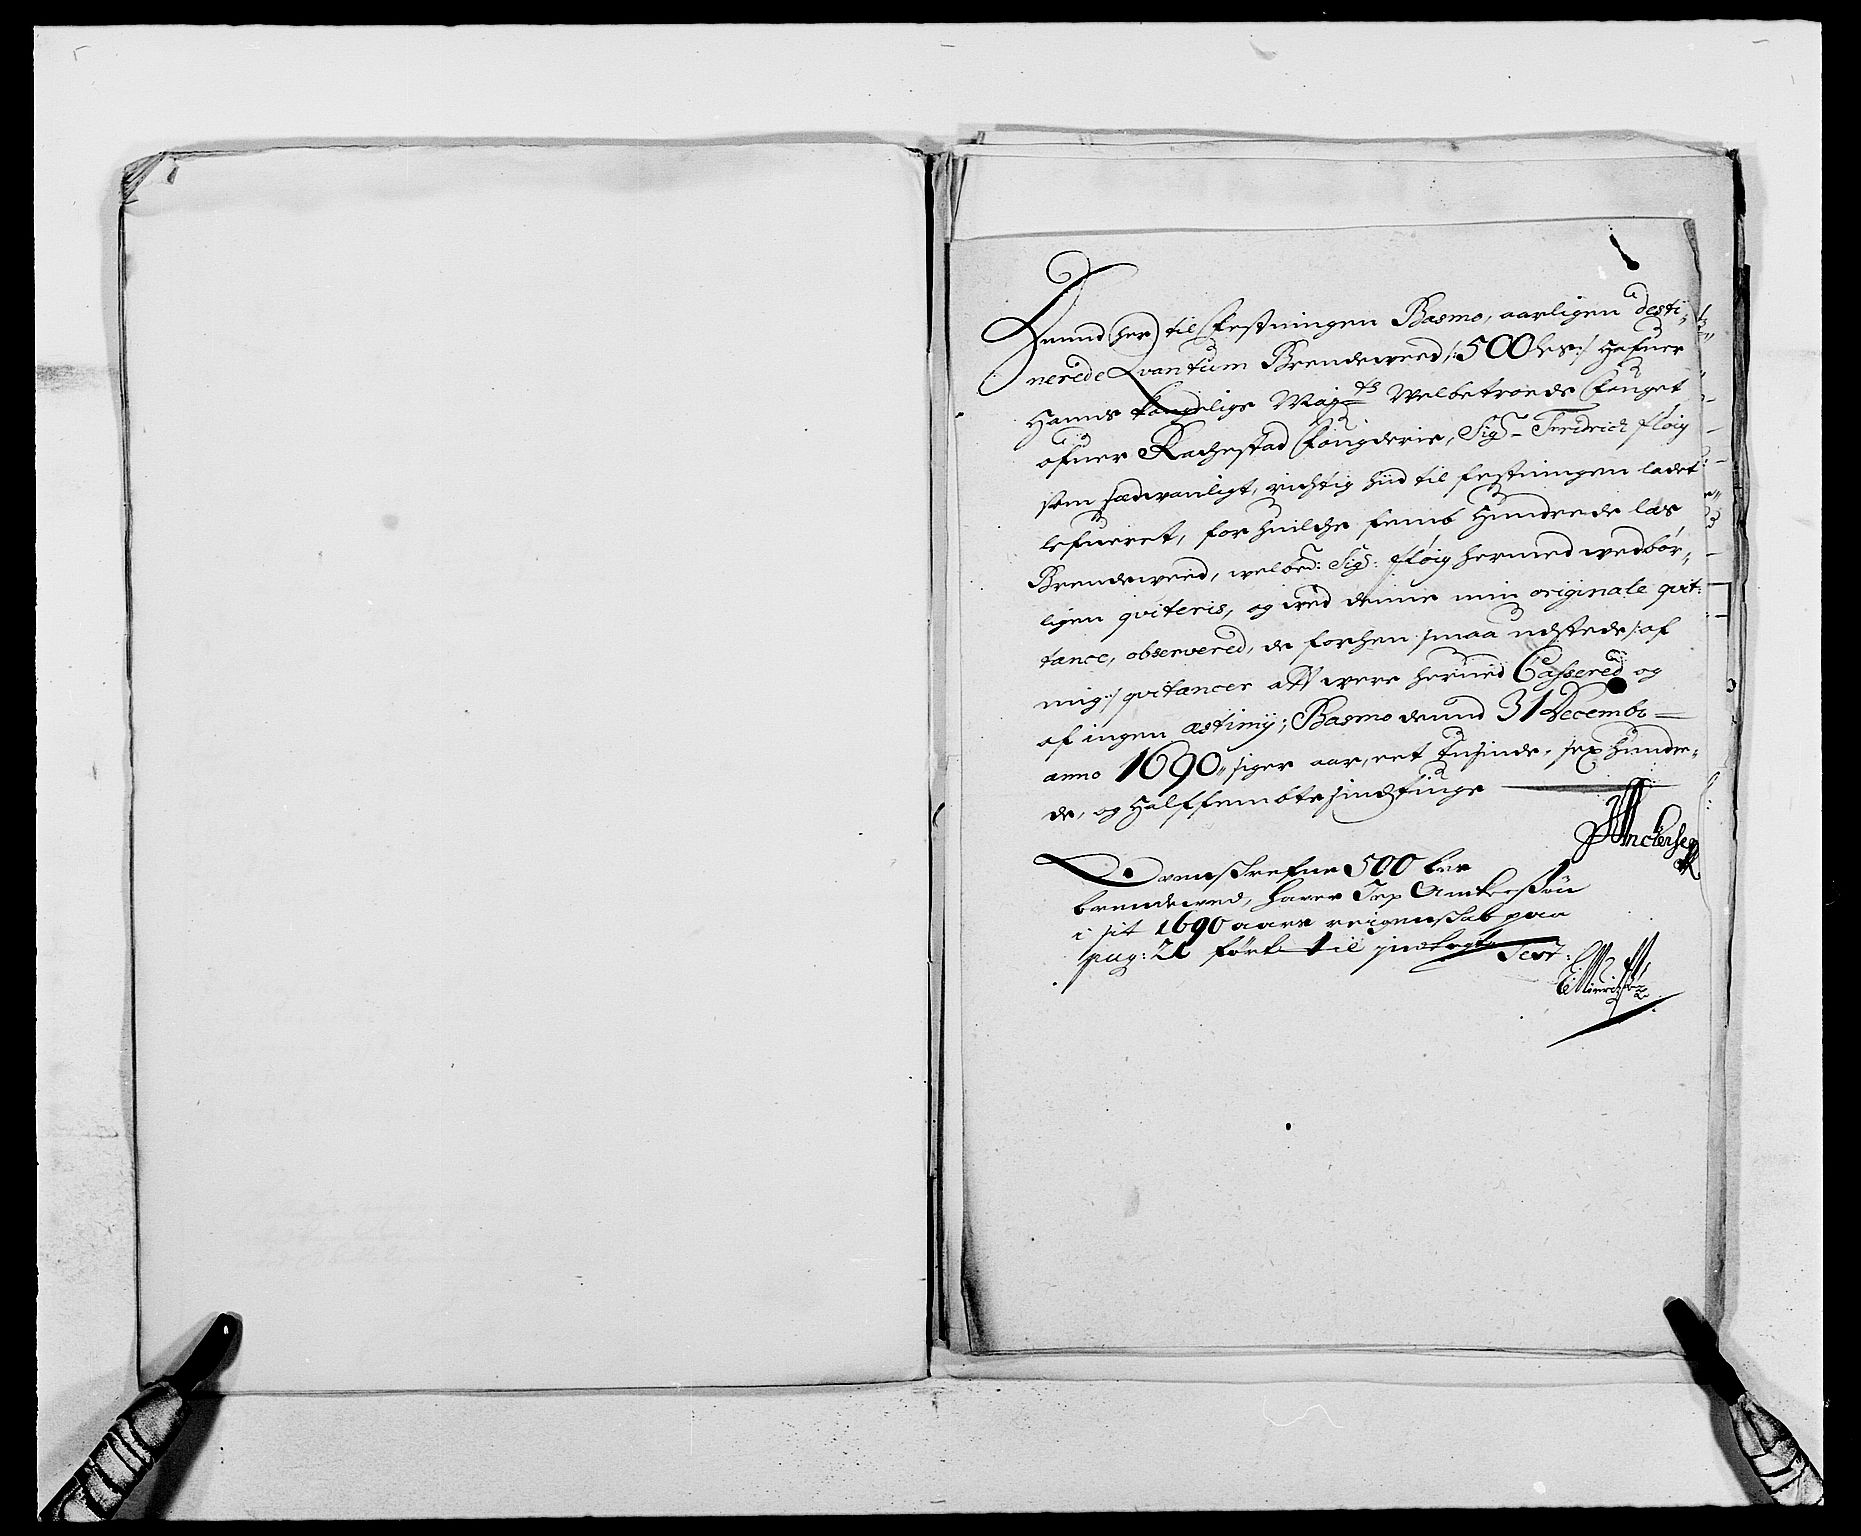 RA, Rentekammeret inntil 1814, Reviderte regnskaper, Fogderegnskap, R05/L0277: Fogderegnskap Rakkestad, 1689-1690, s. 376